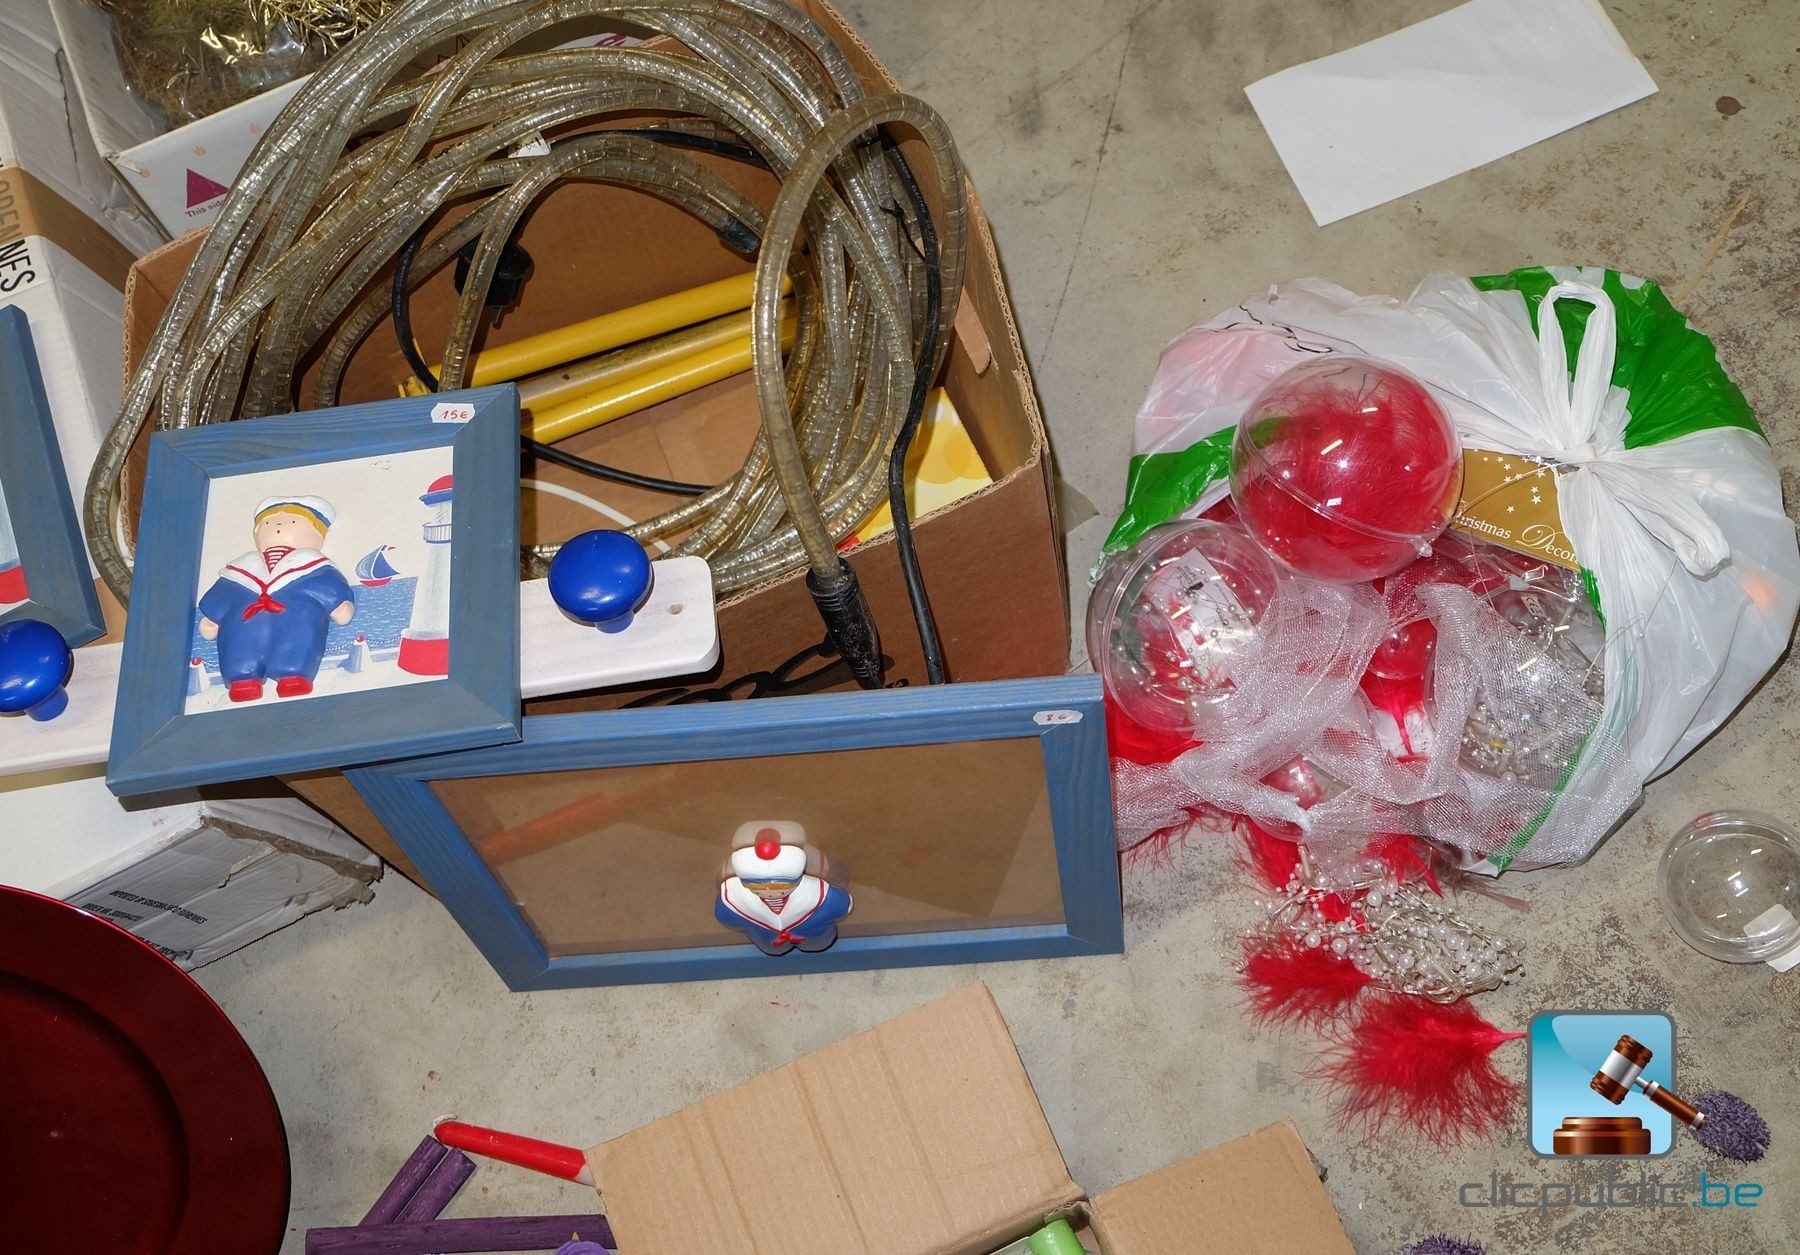 #AE1D2D Décorations De Noël (ref. 27) à Vendre Sur Clicpublic.be 5319 decorations de noel a vendre 1800x1255 px @ aertt.com